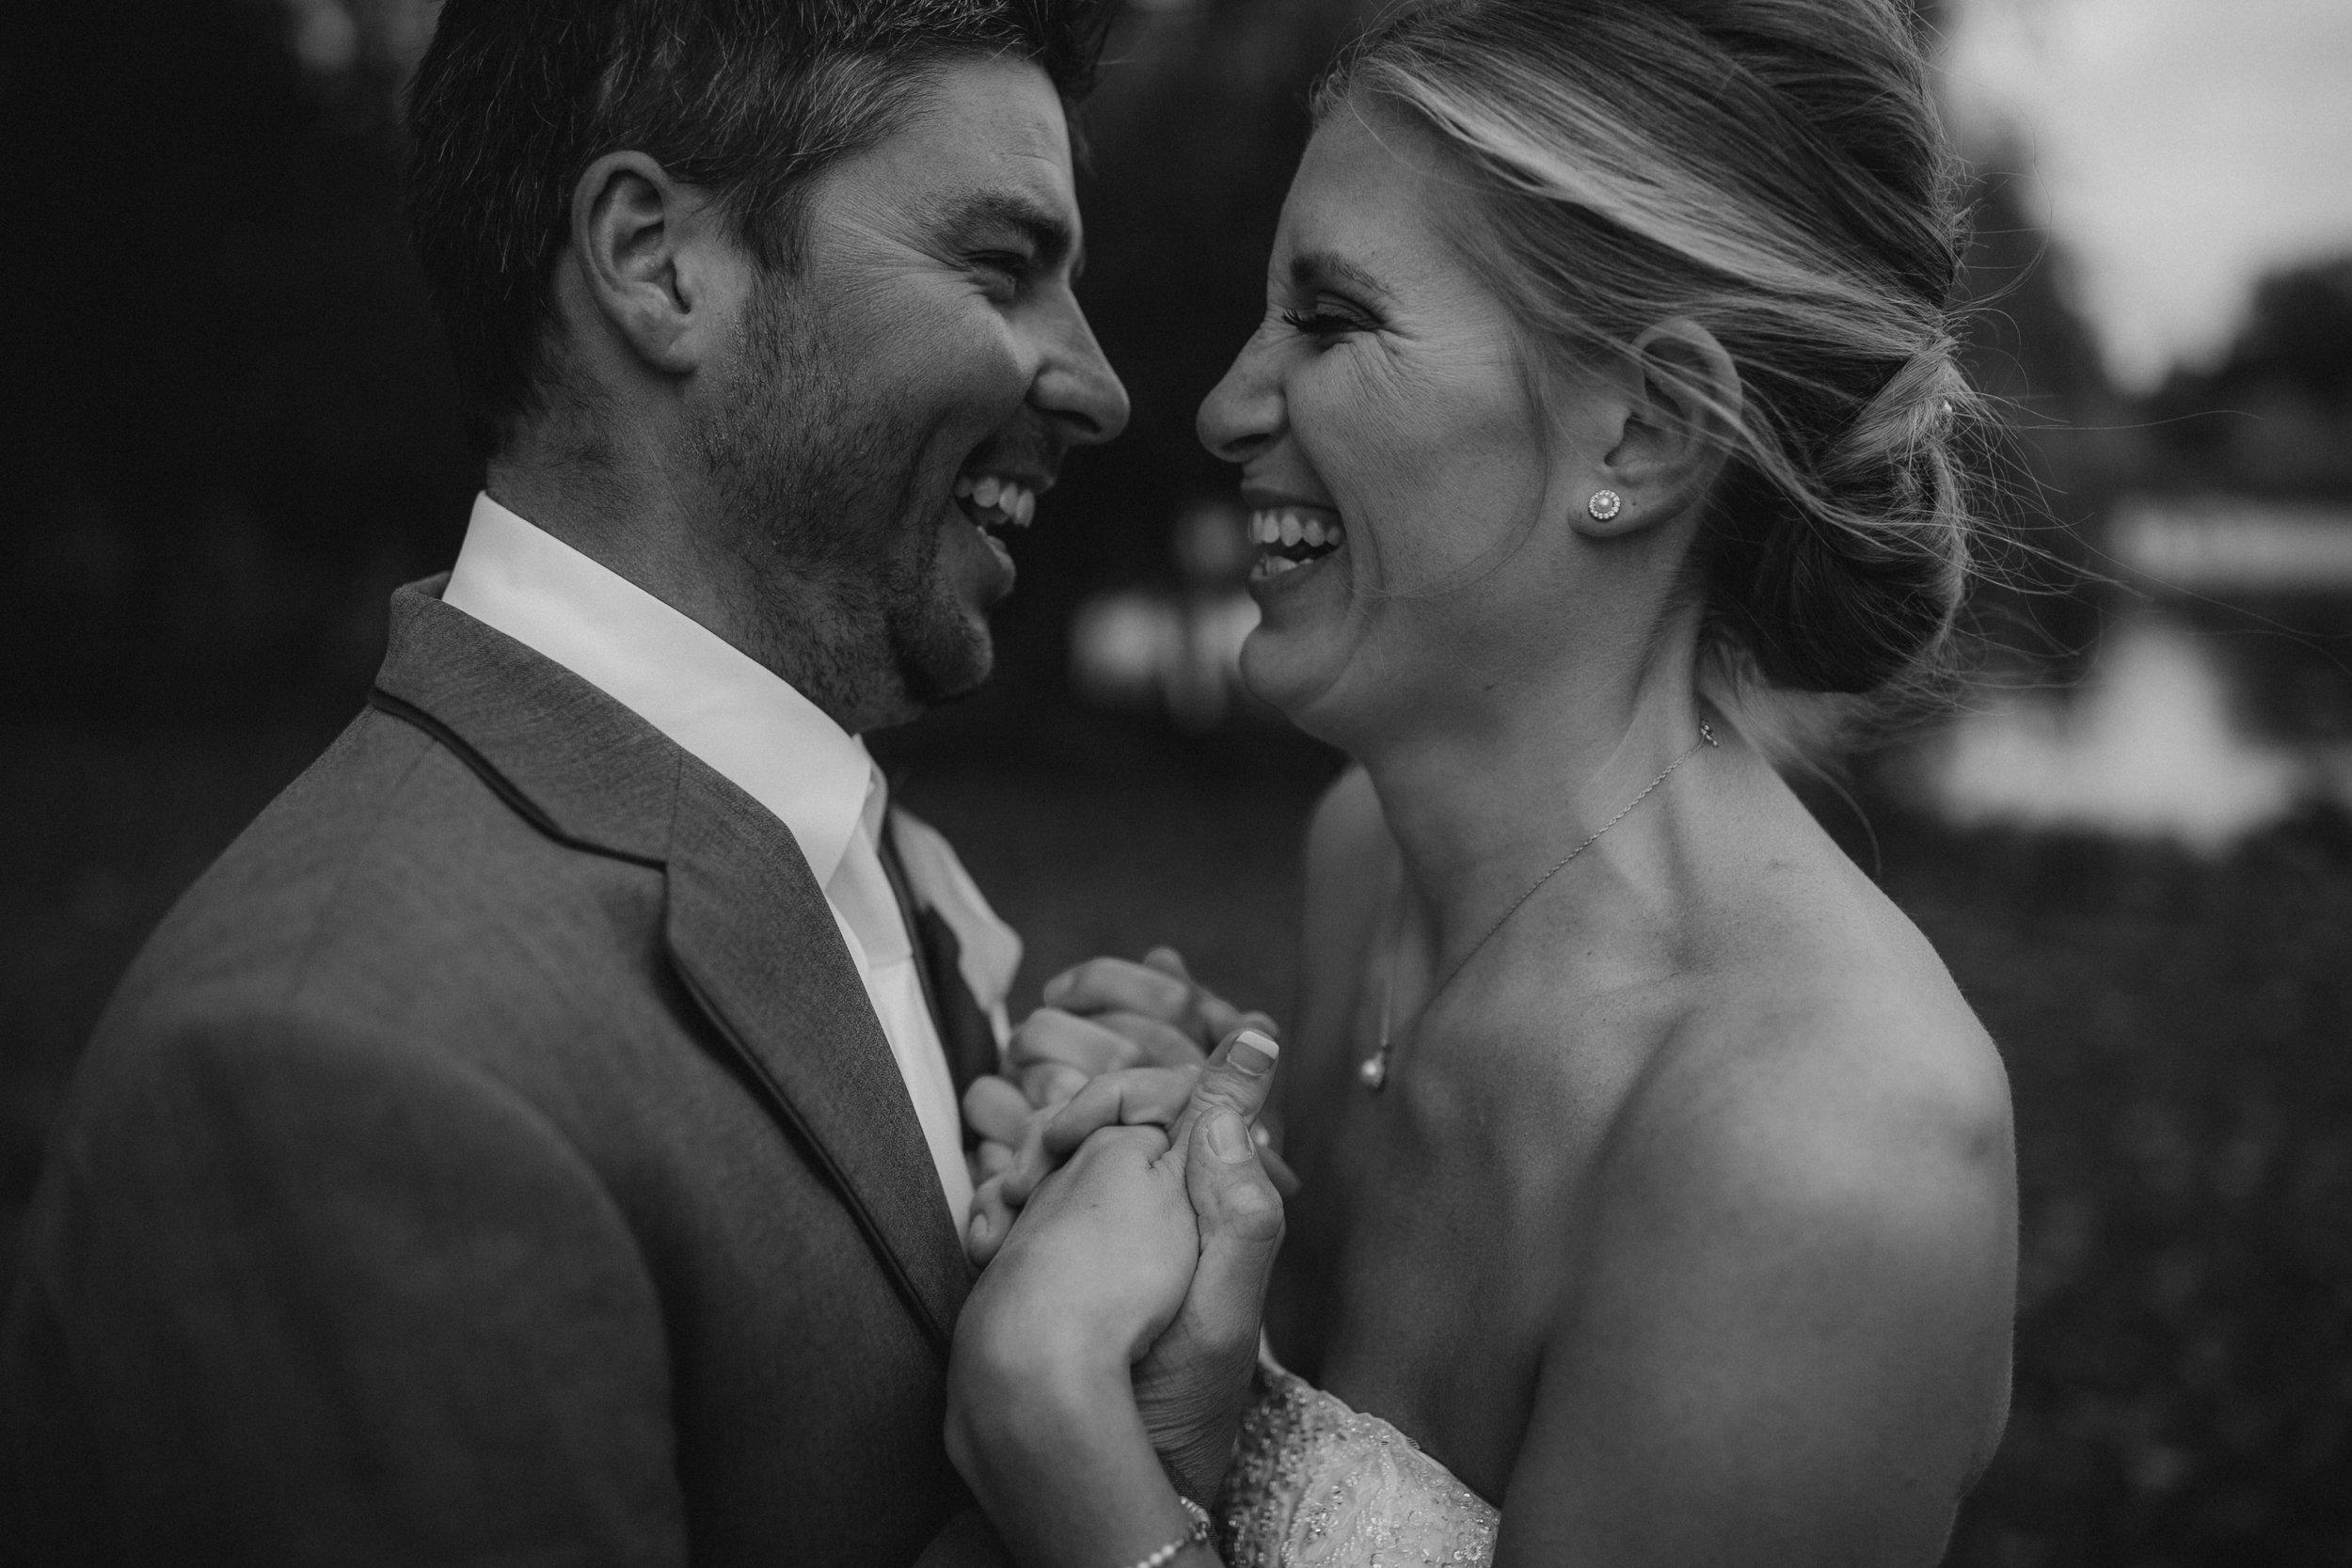 2018-10-Kristin-Alex-Preview-Grand-Rapids-Wedding-Michigan-Wedding-Photographer-145.jpg